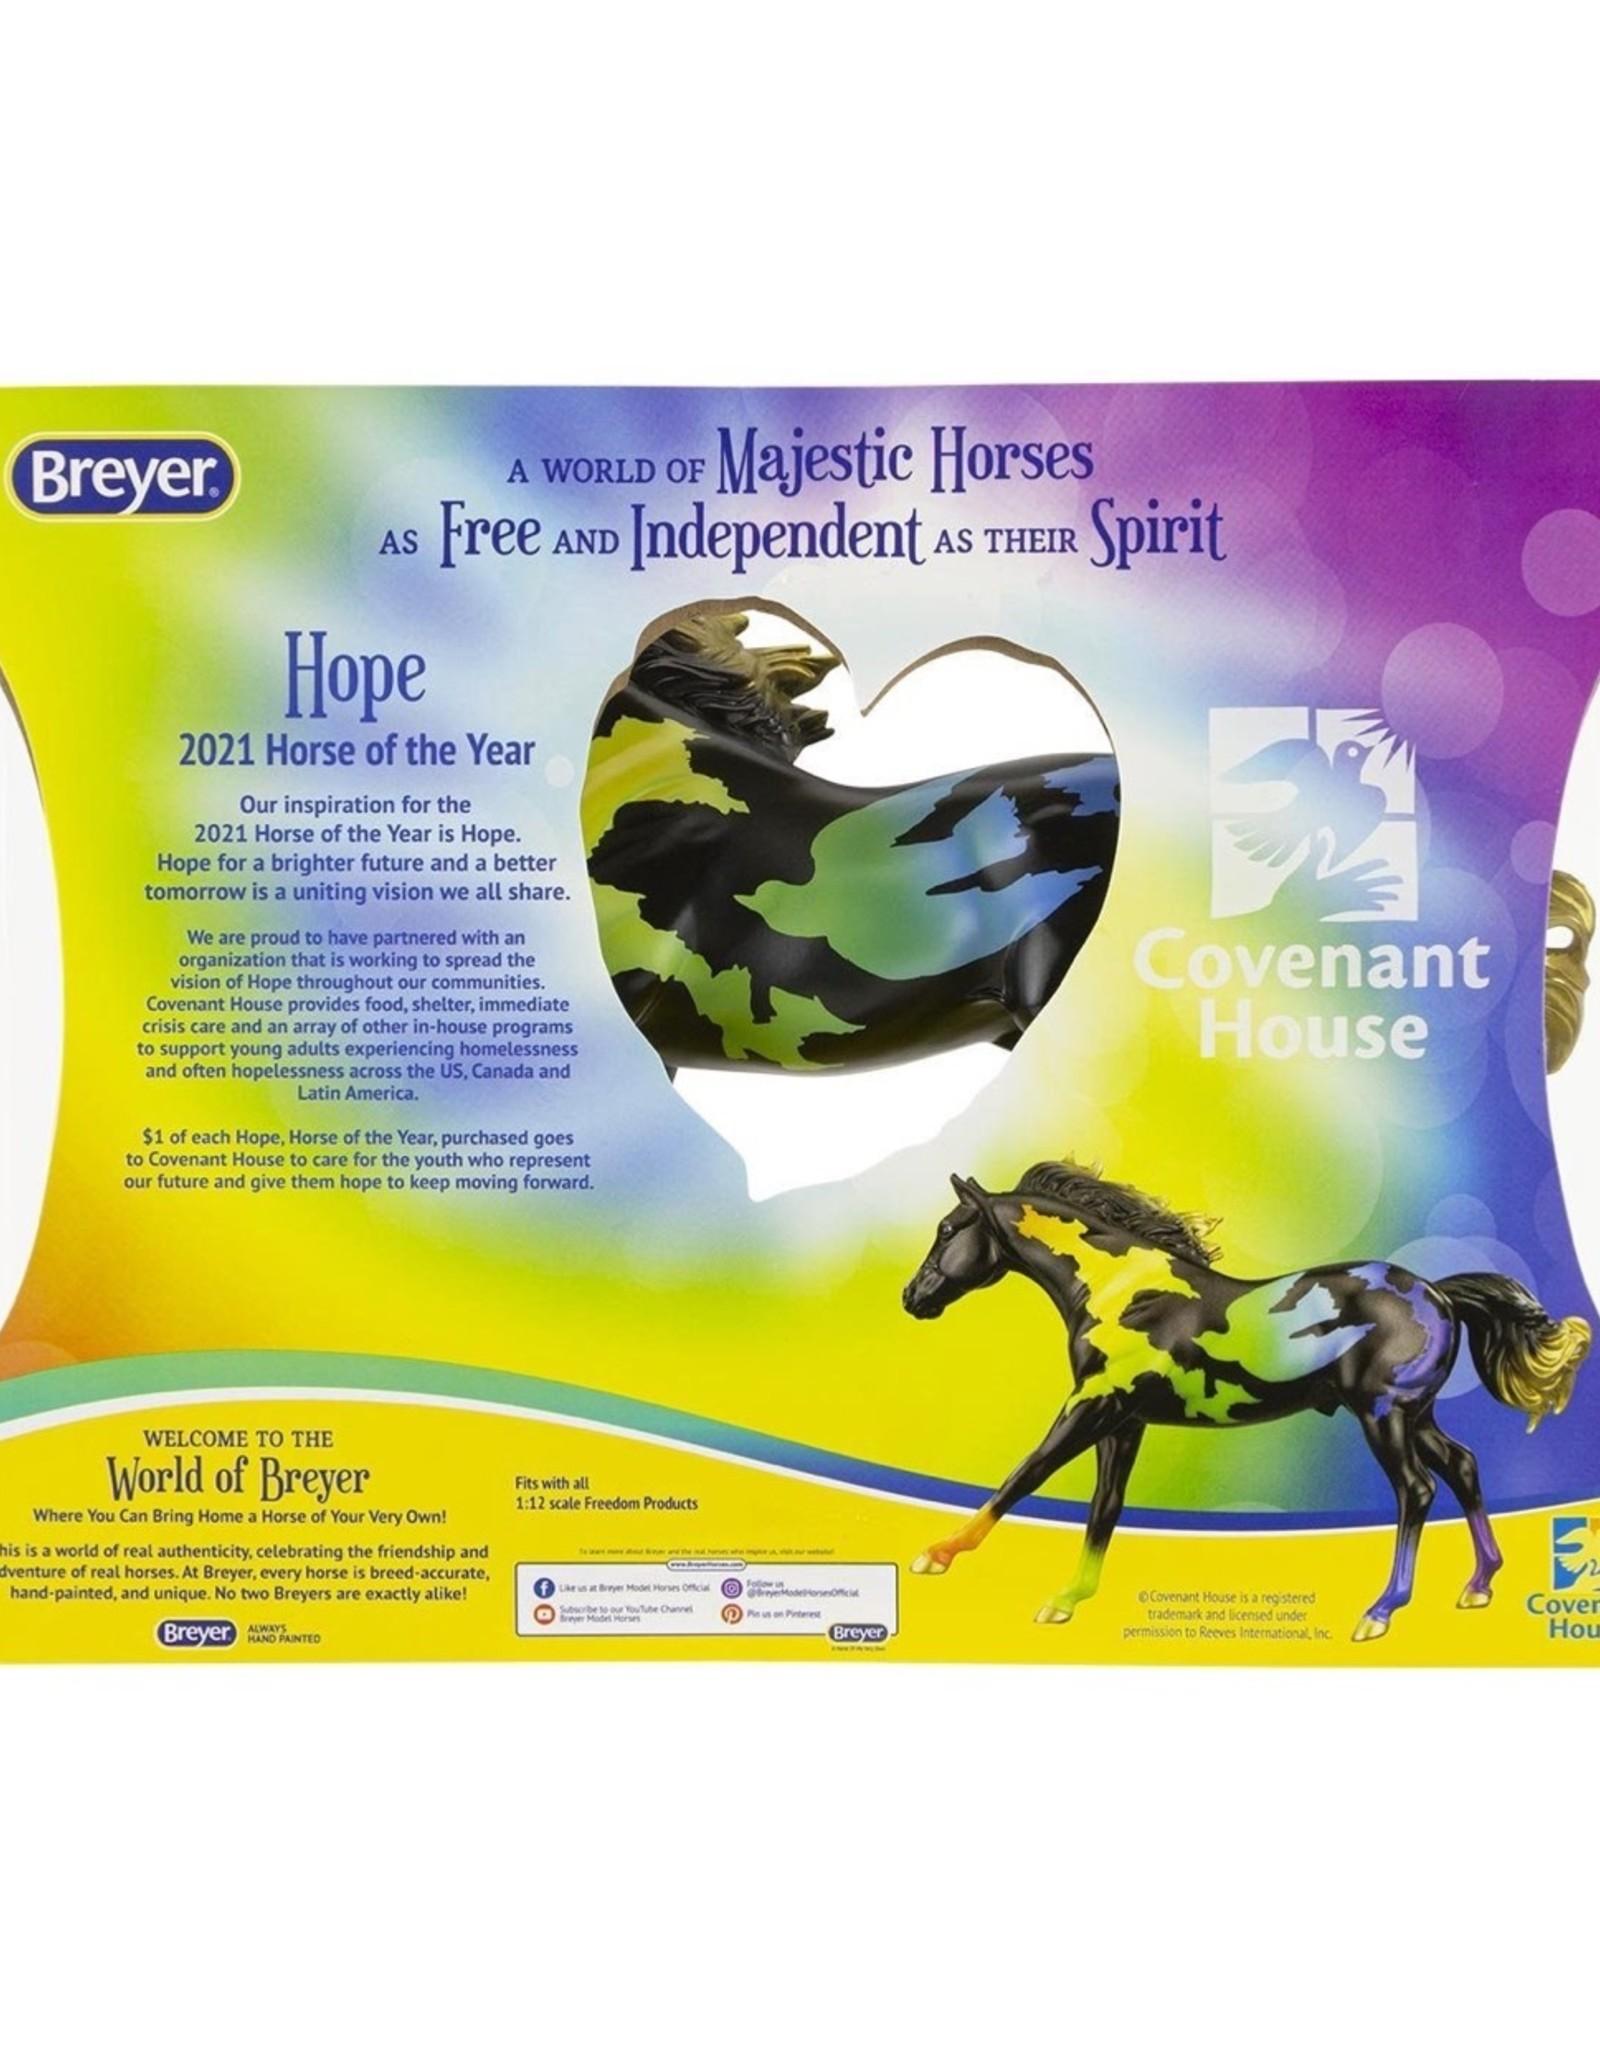 Breyer Hope 2021 Horse of the Year